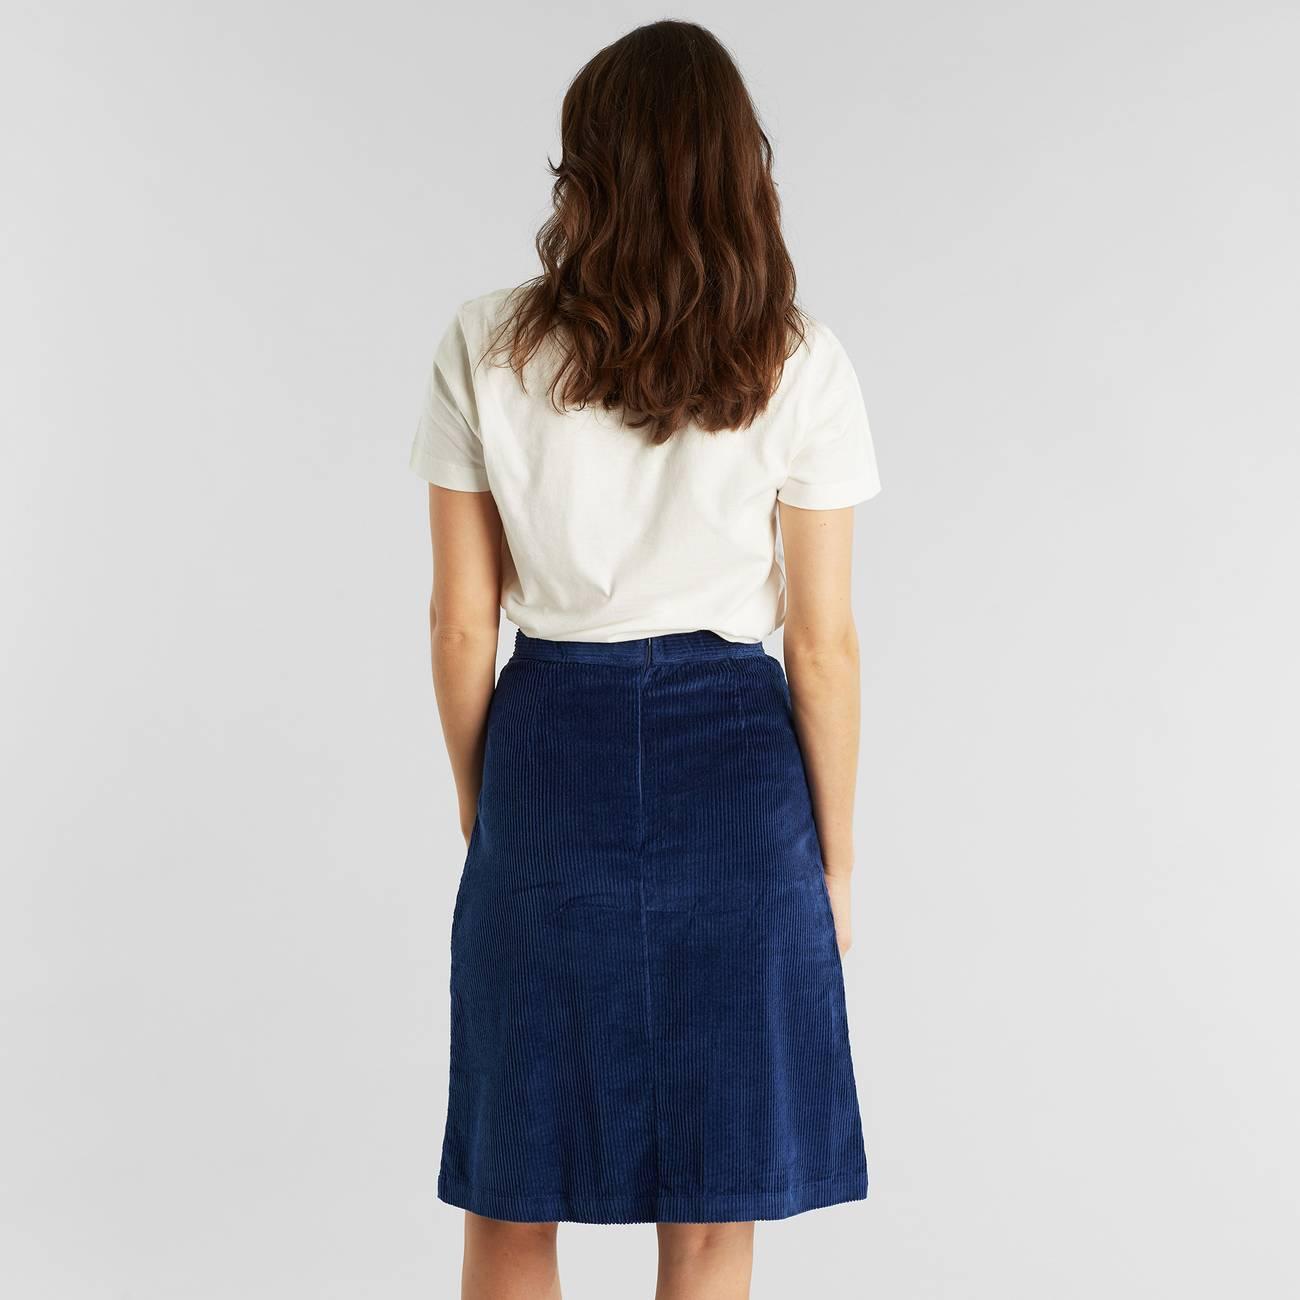 Skirt Haga Corduroy Deep Blue